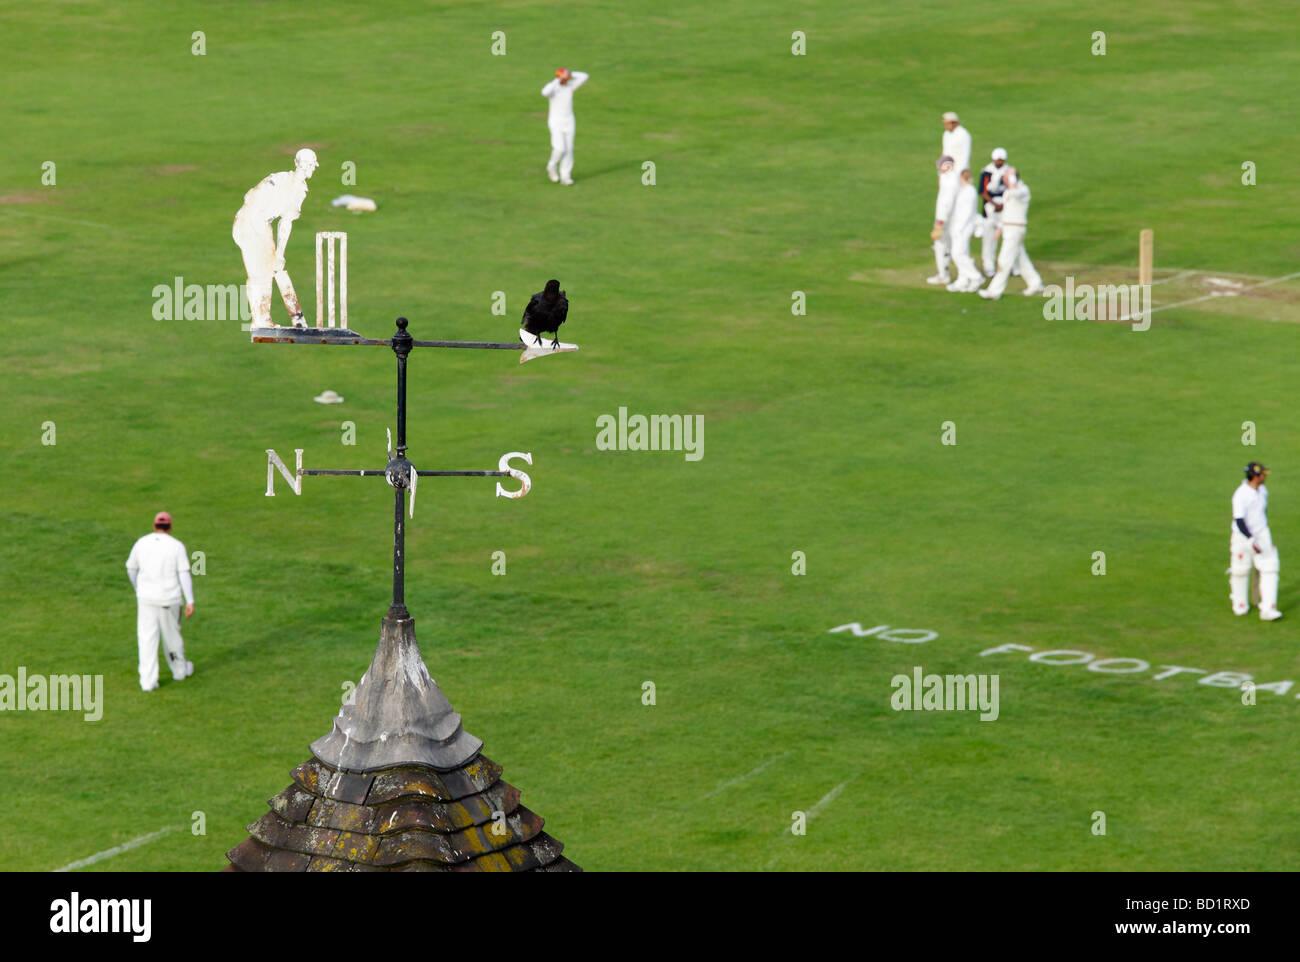 Cricket match on Parker's Piece, Cambridge 2 - Stock Image